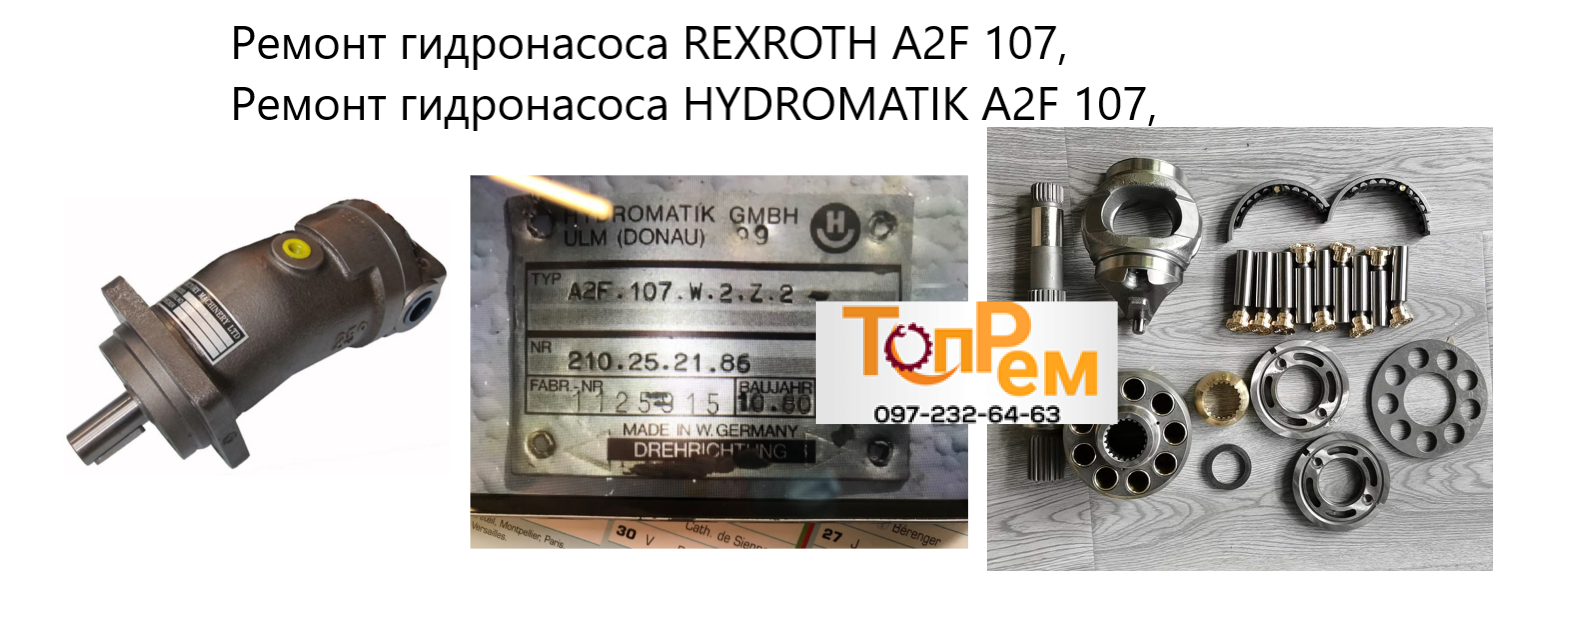 Ремонт гидронасоса REXROTH A2F 107